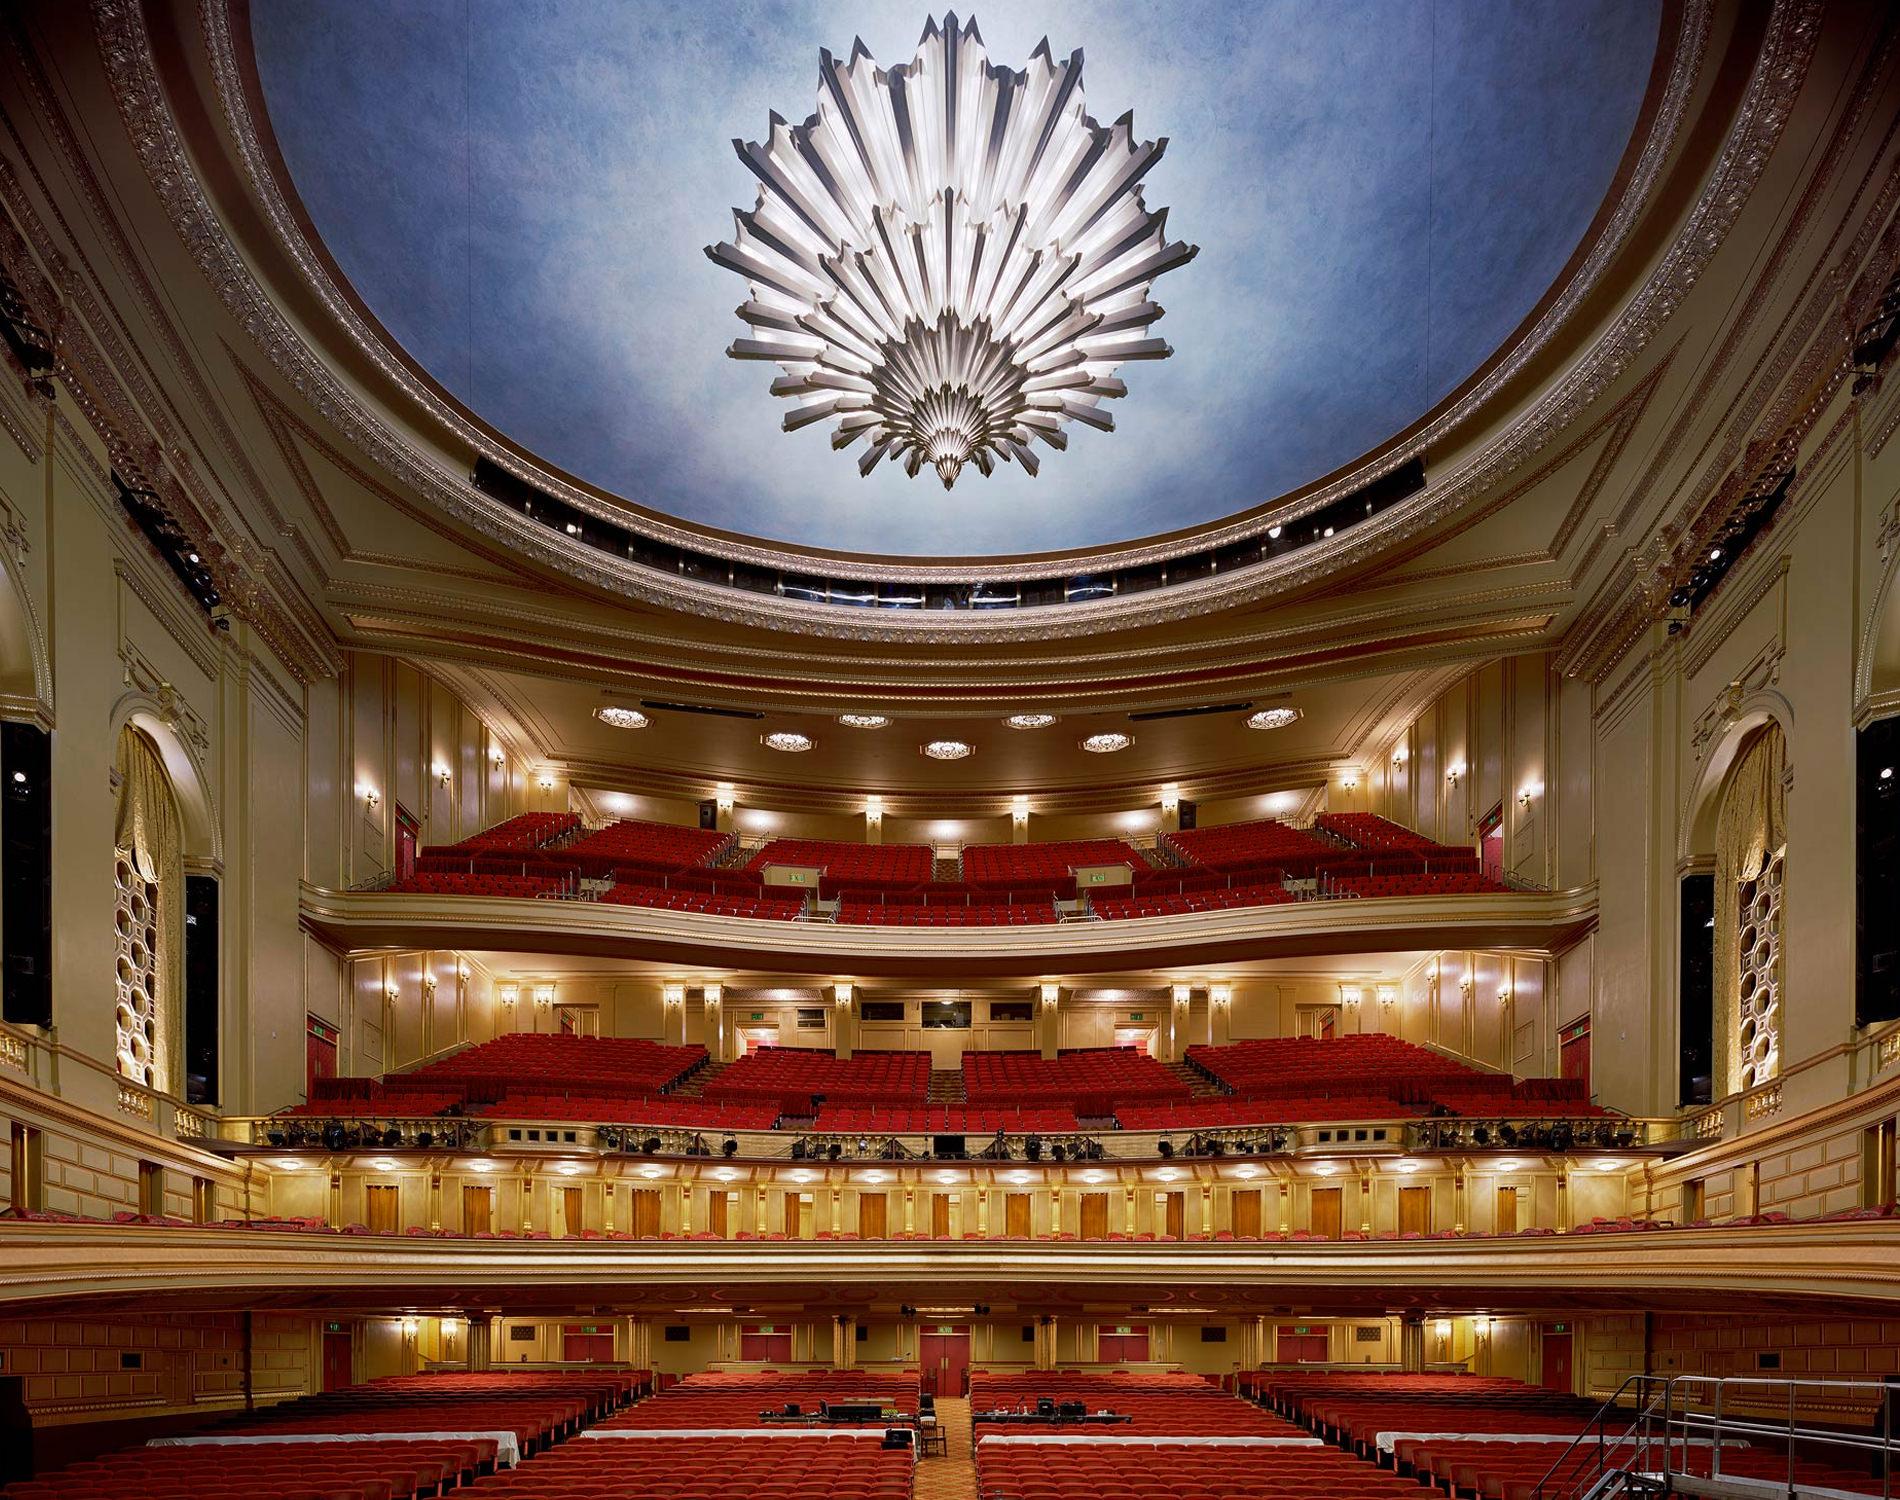 David Leventi Serie Photographie Opera War Memorial Opera House San Francisco Etats-Unis 2009